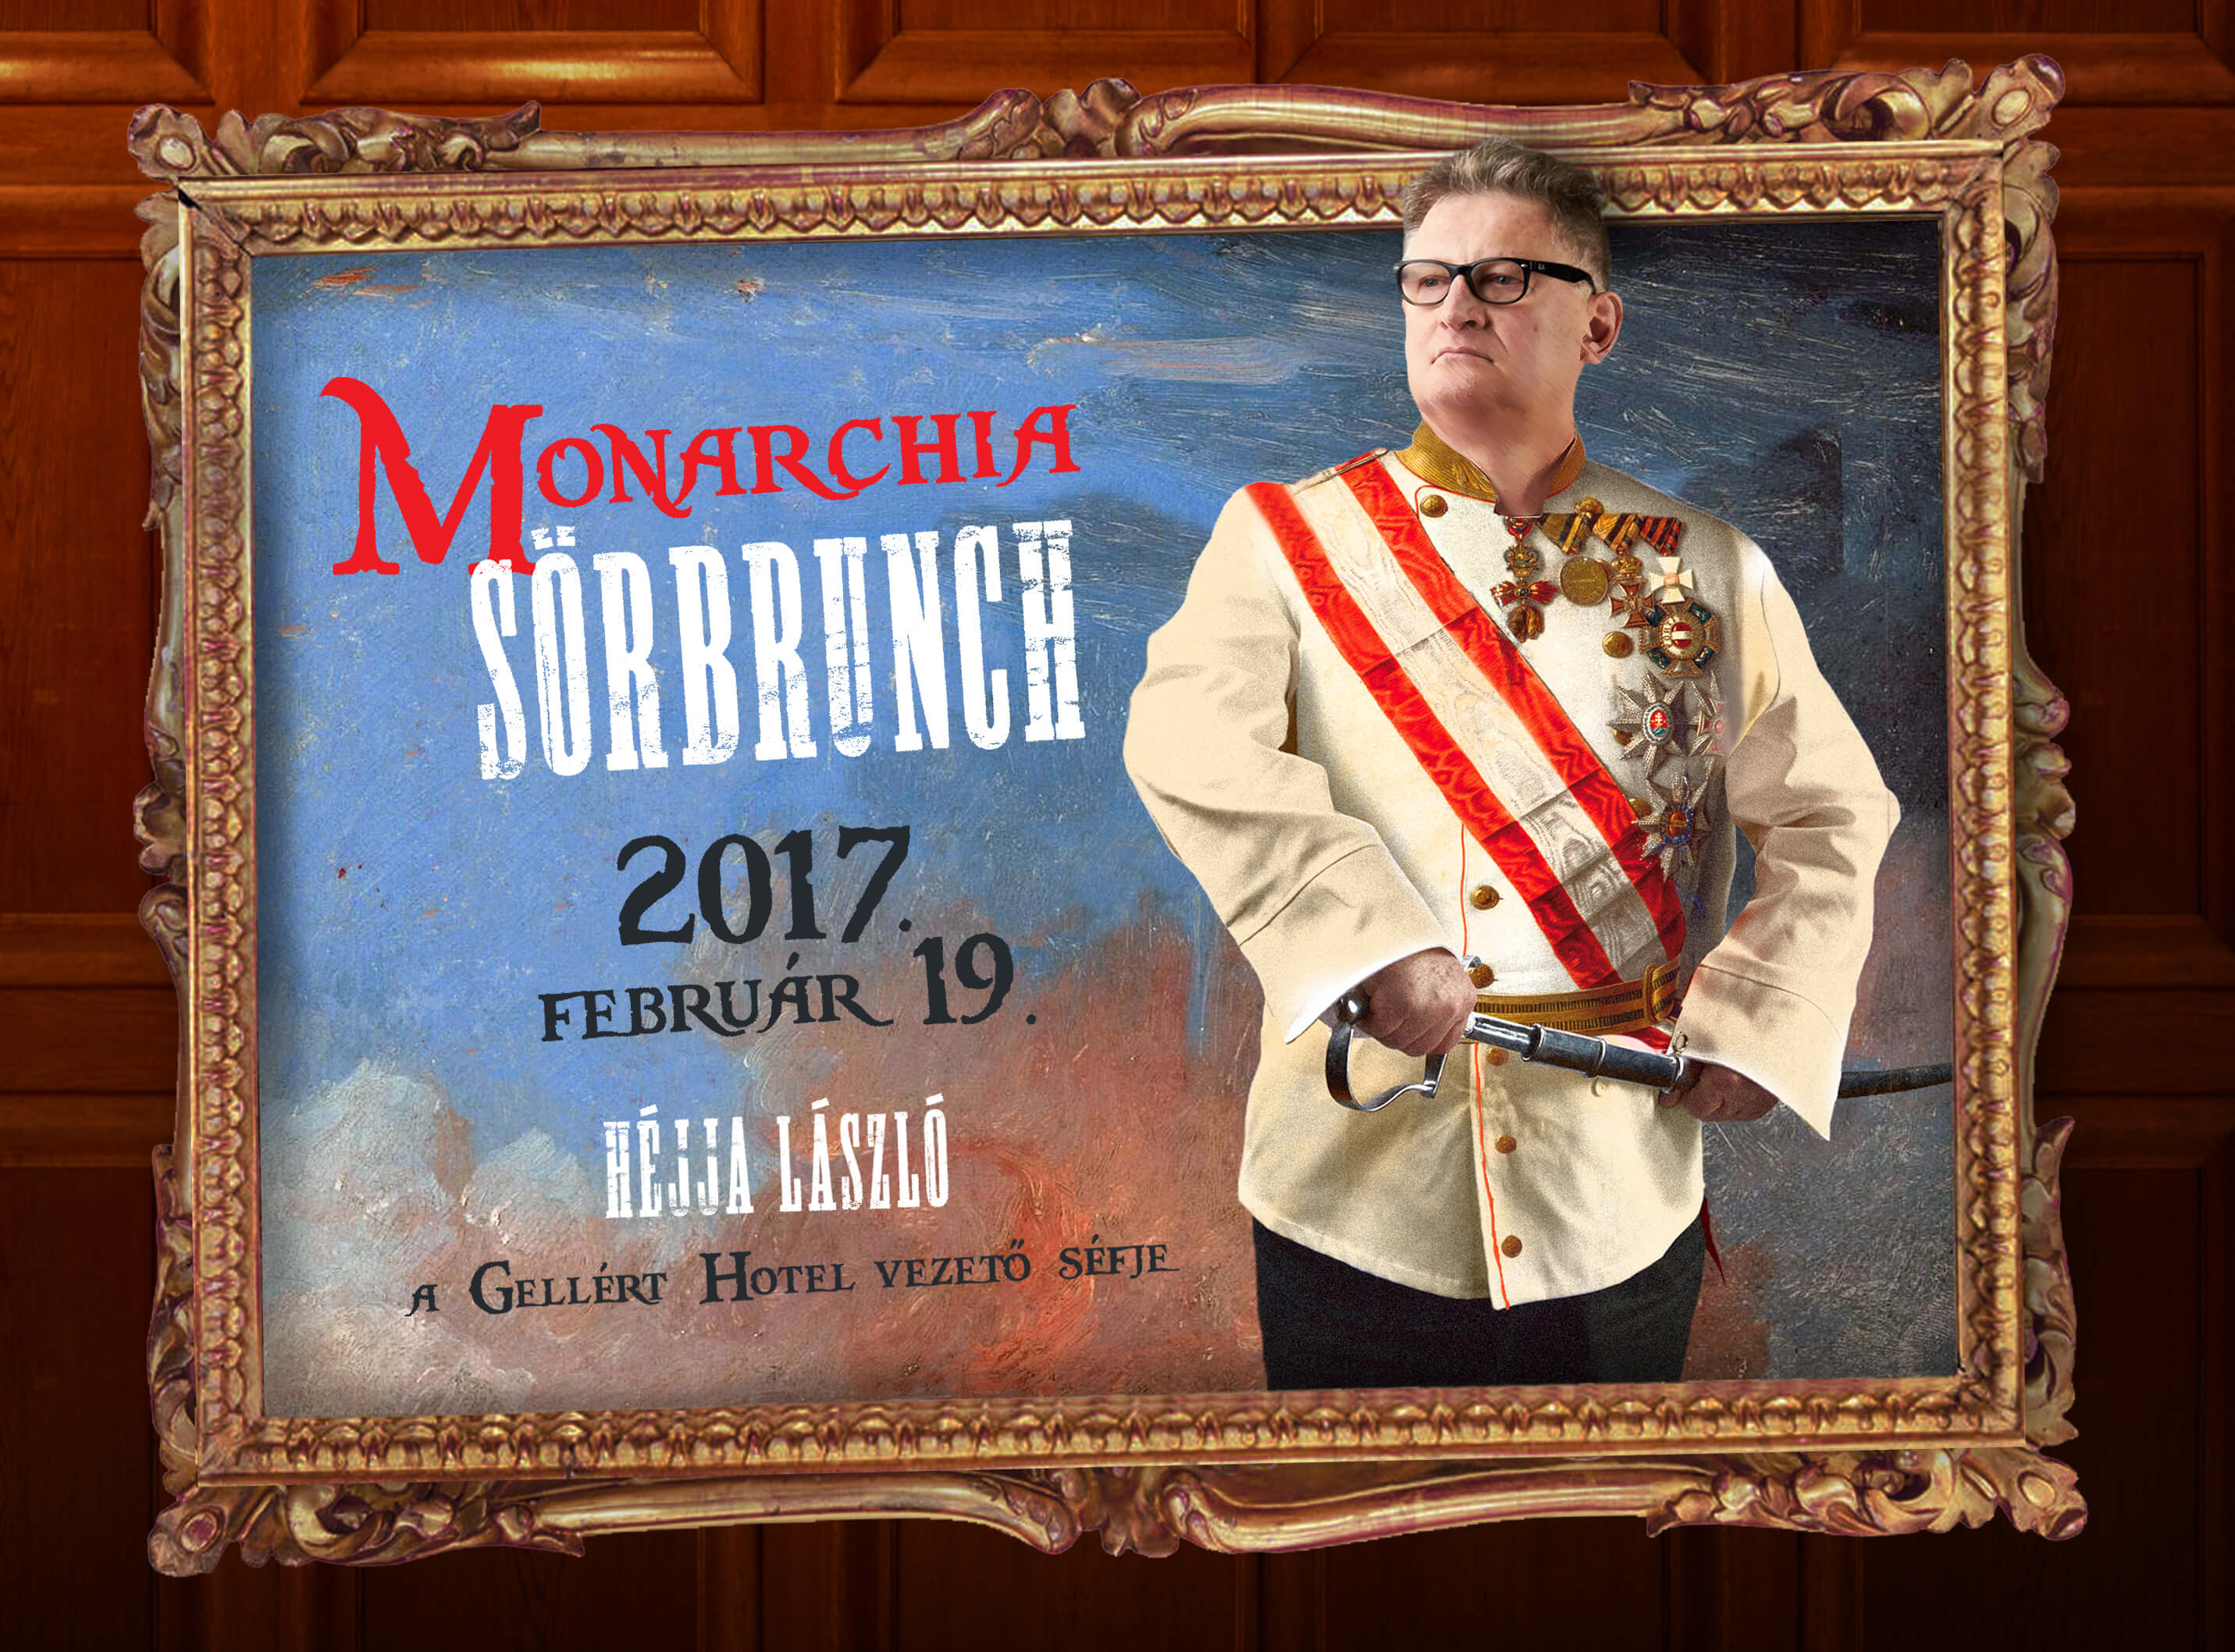 Monarchia Sörbrunch_II. Indoor Sörfesztivál